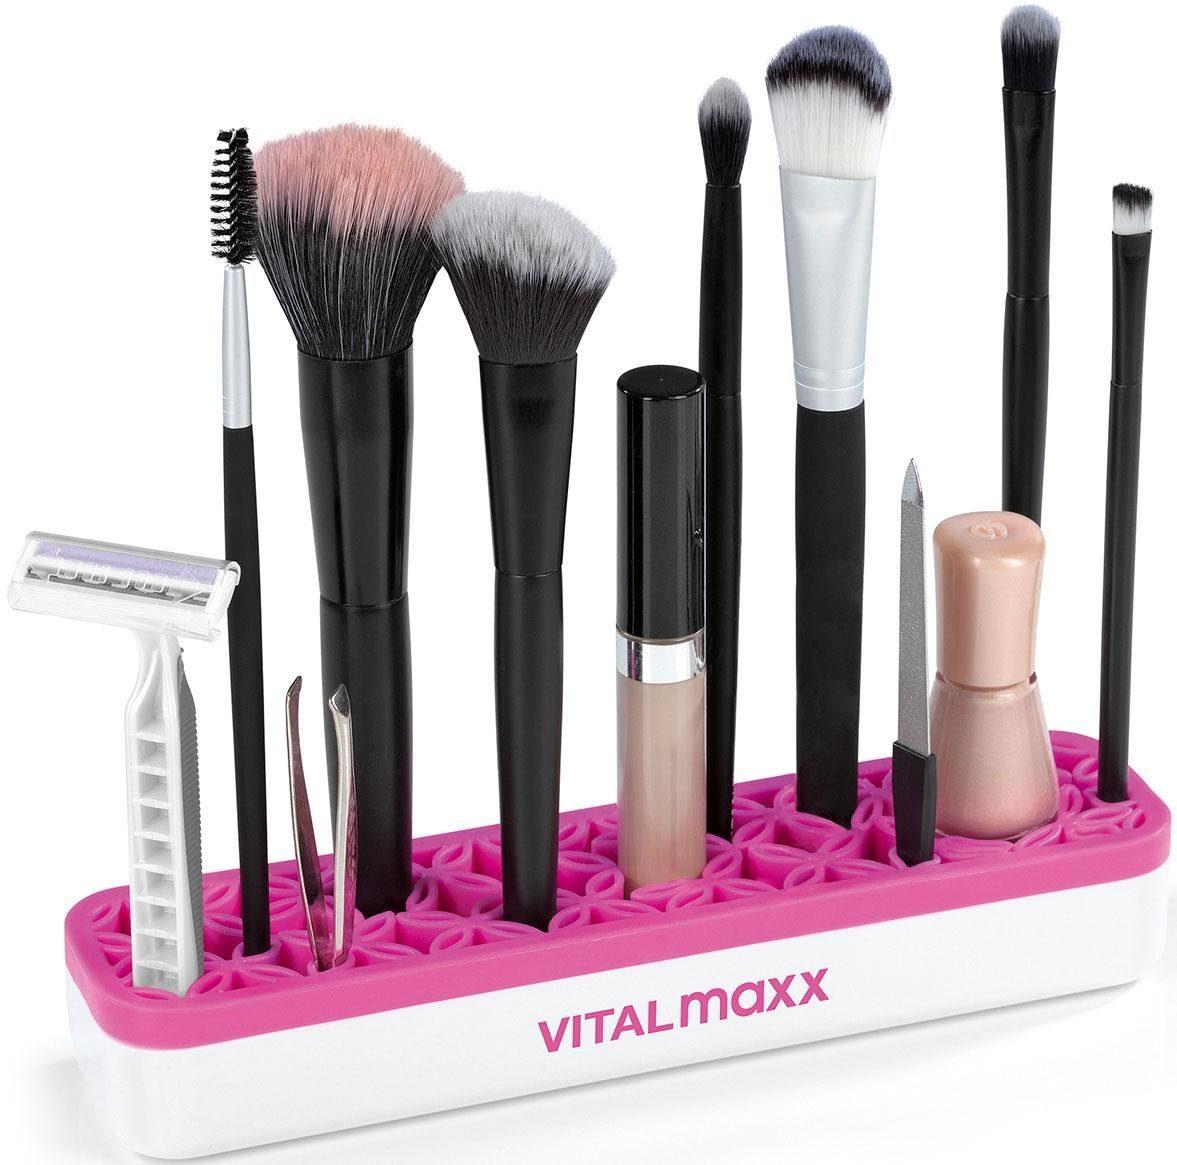 Vitalmaxx, »Make-Up Organizer«, weiß/pink (2-tlg.)